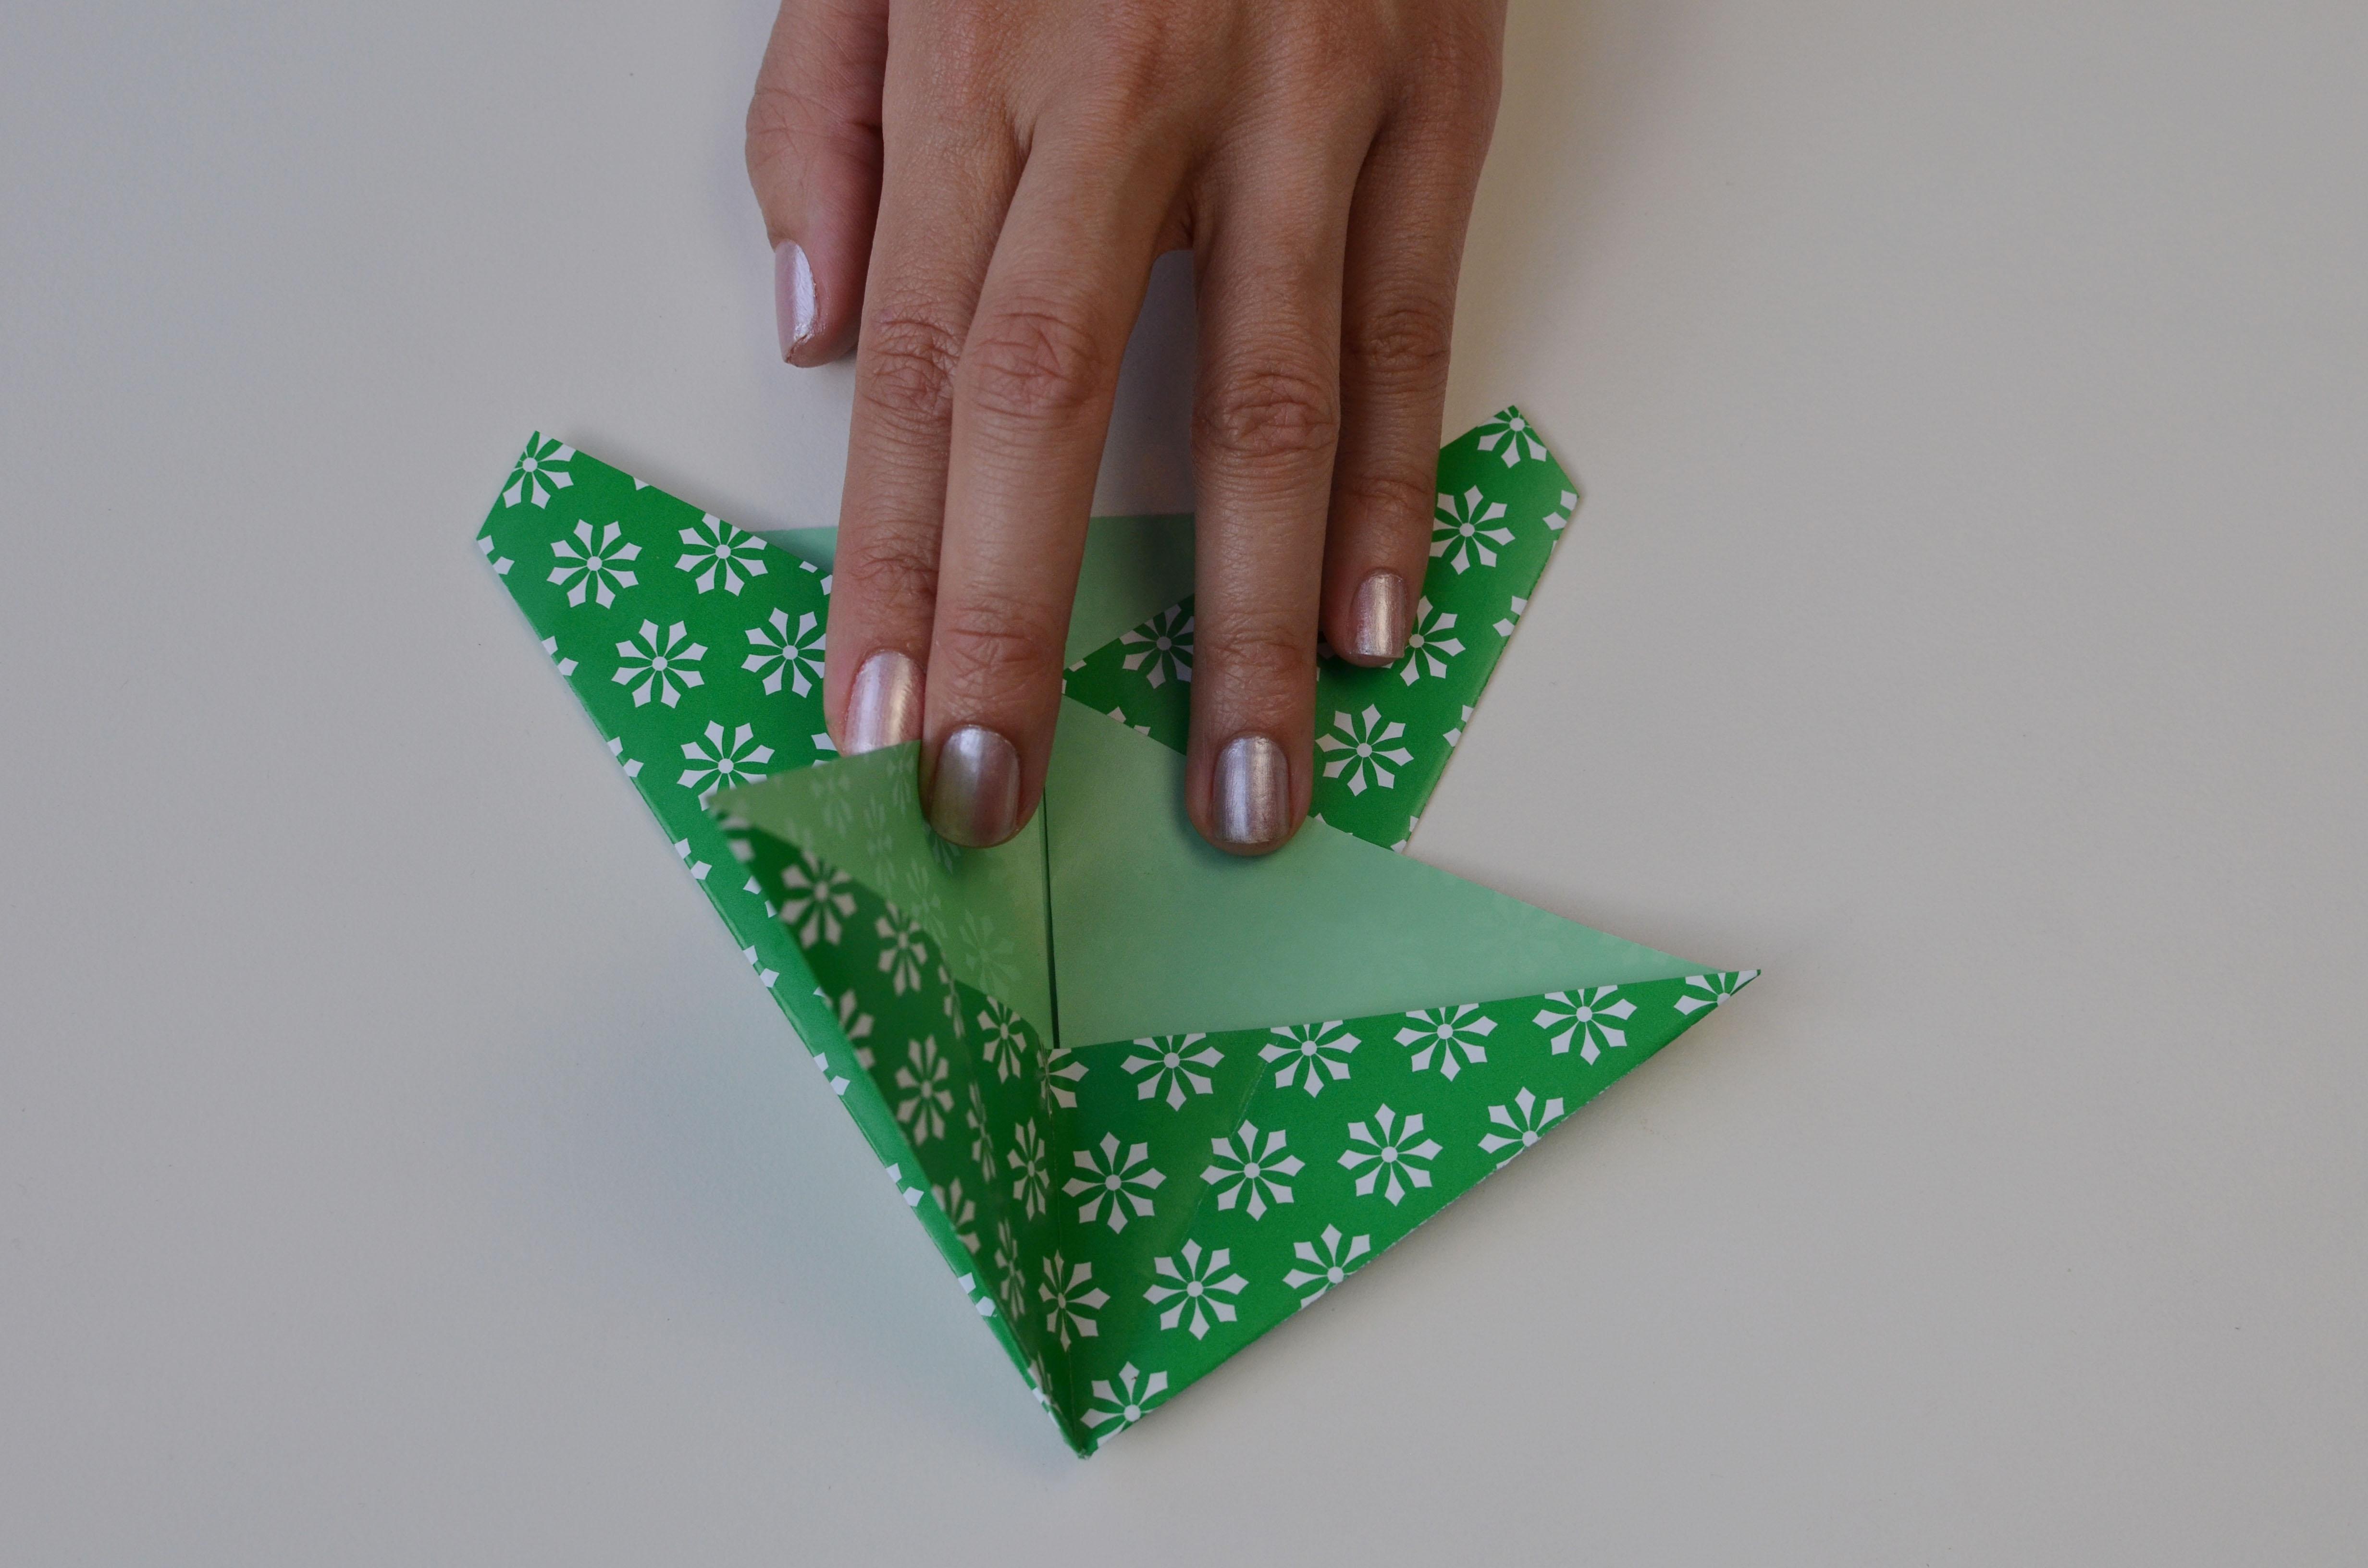 braincrafts_frog_origami_pt17.jpg